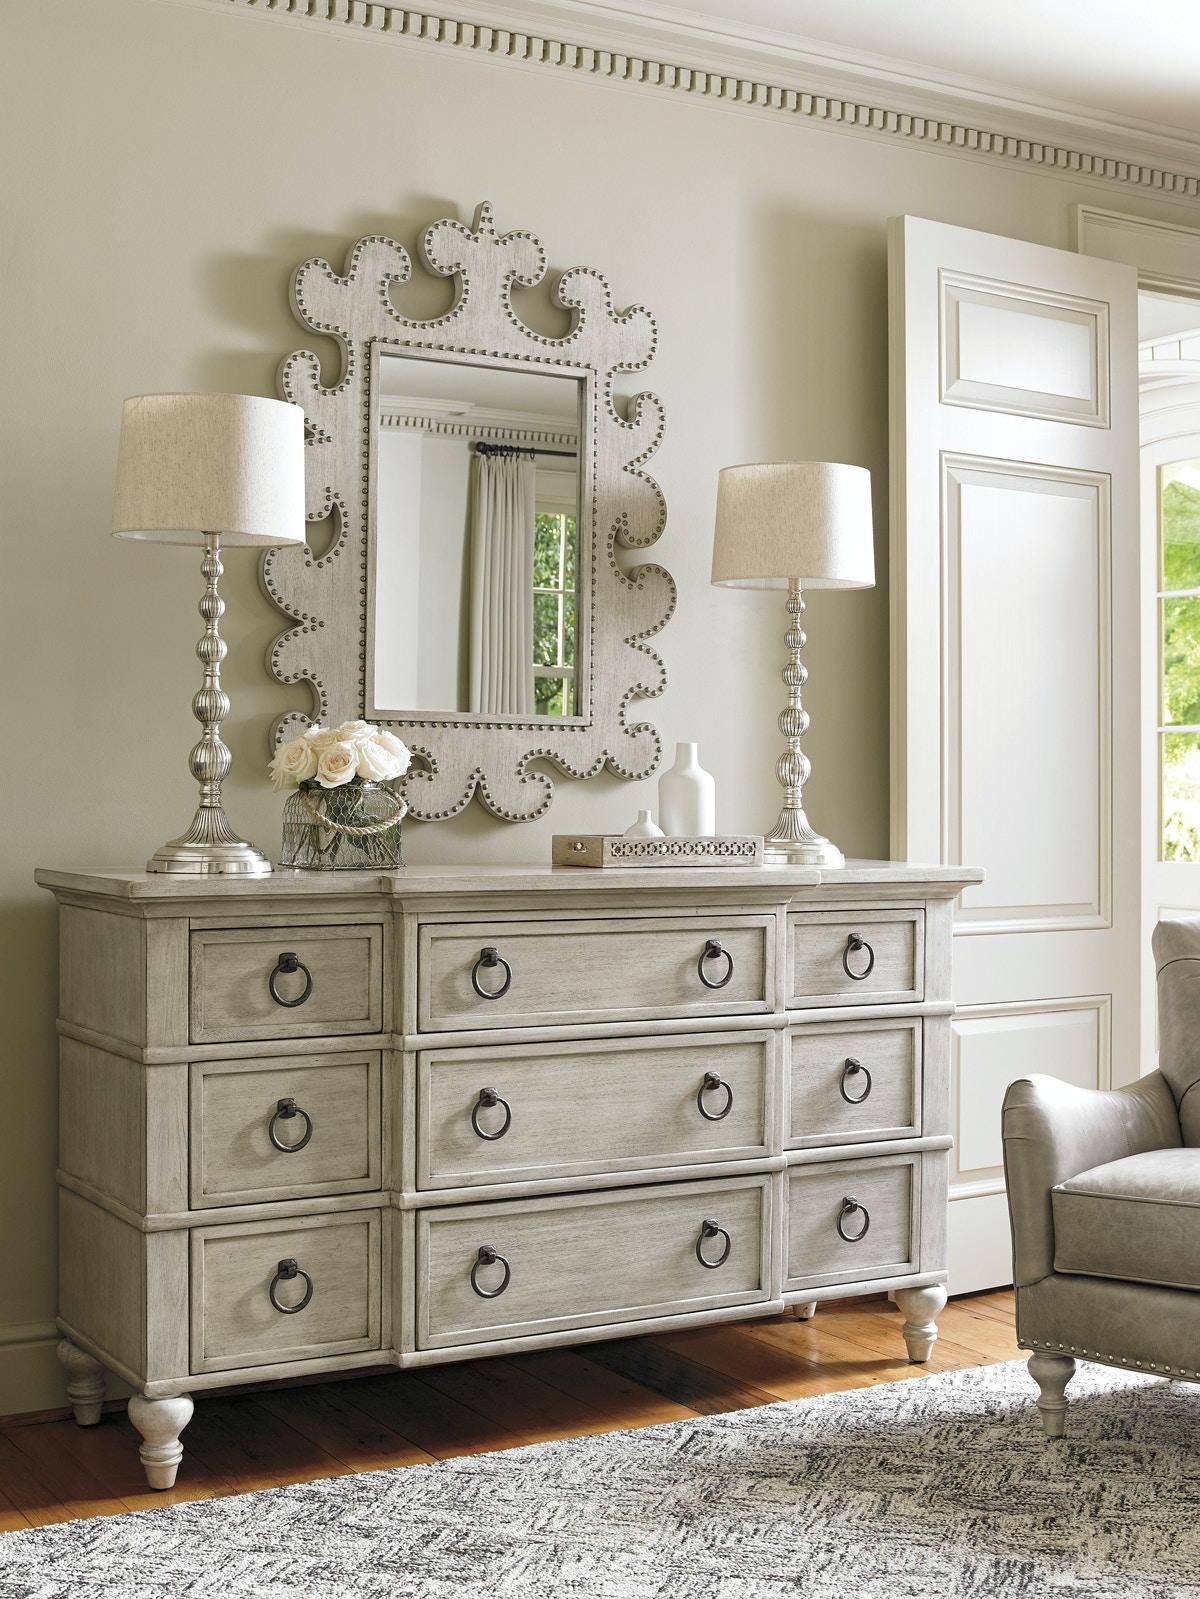 Lexington Furniture Oyster Bay Barrett Triple Dresser 714 233